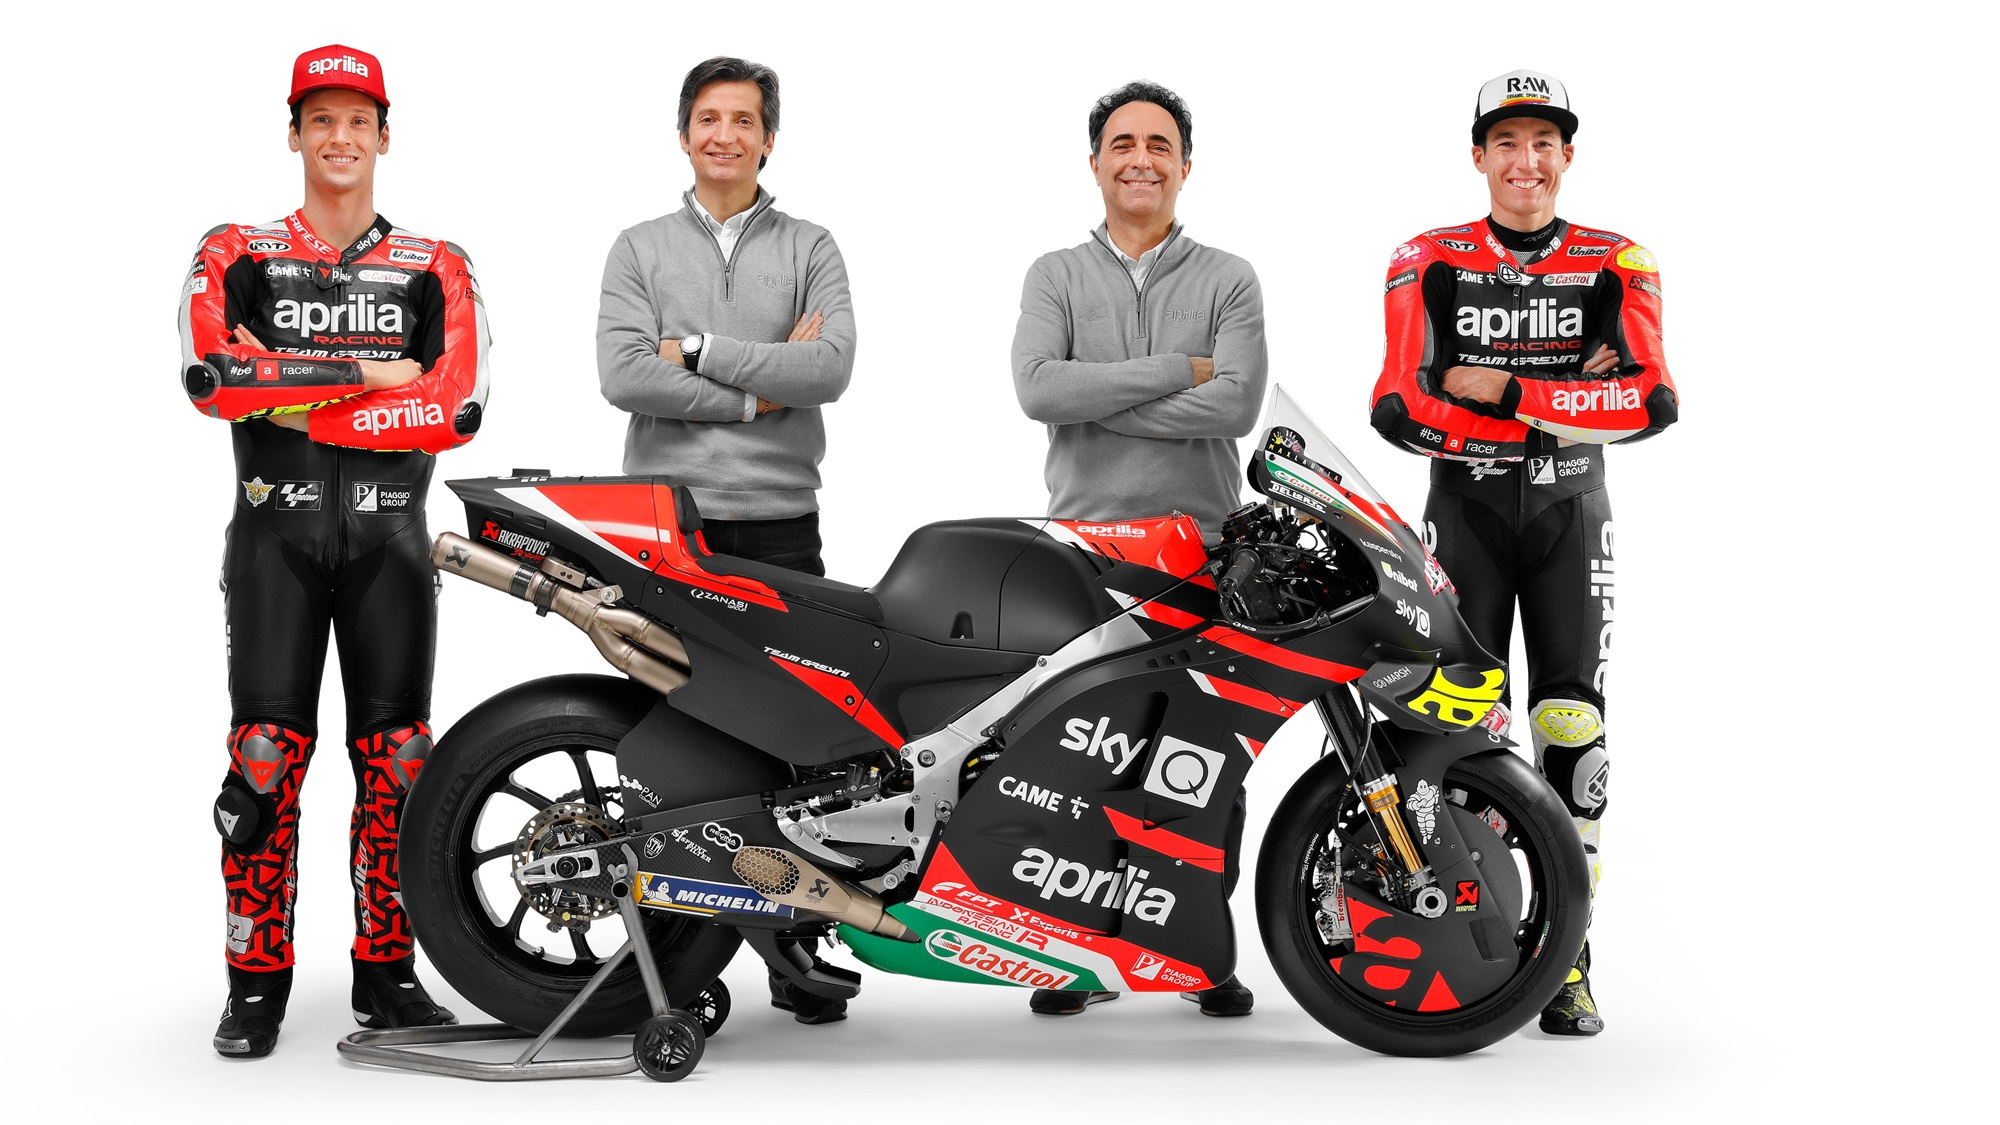 2021 Aprilia Racing Team Gresini witn RS-GP